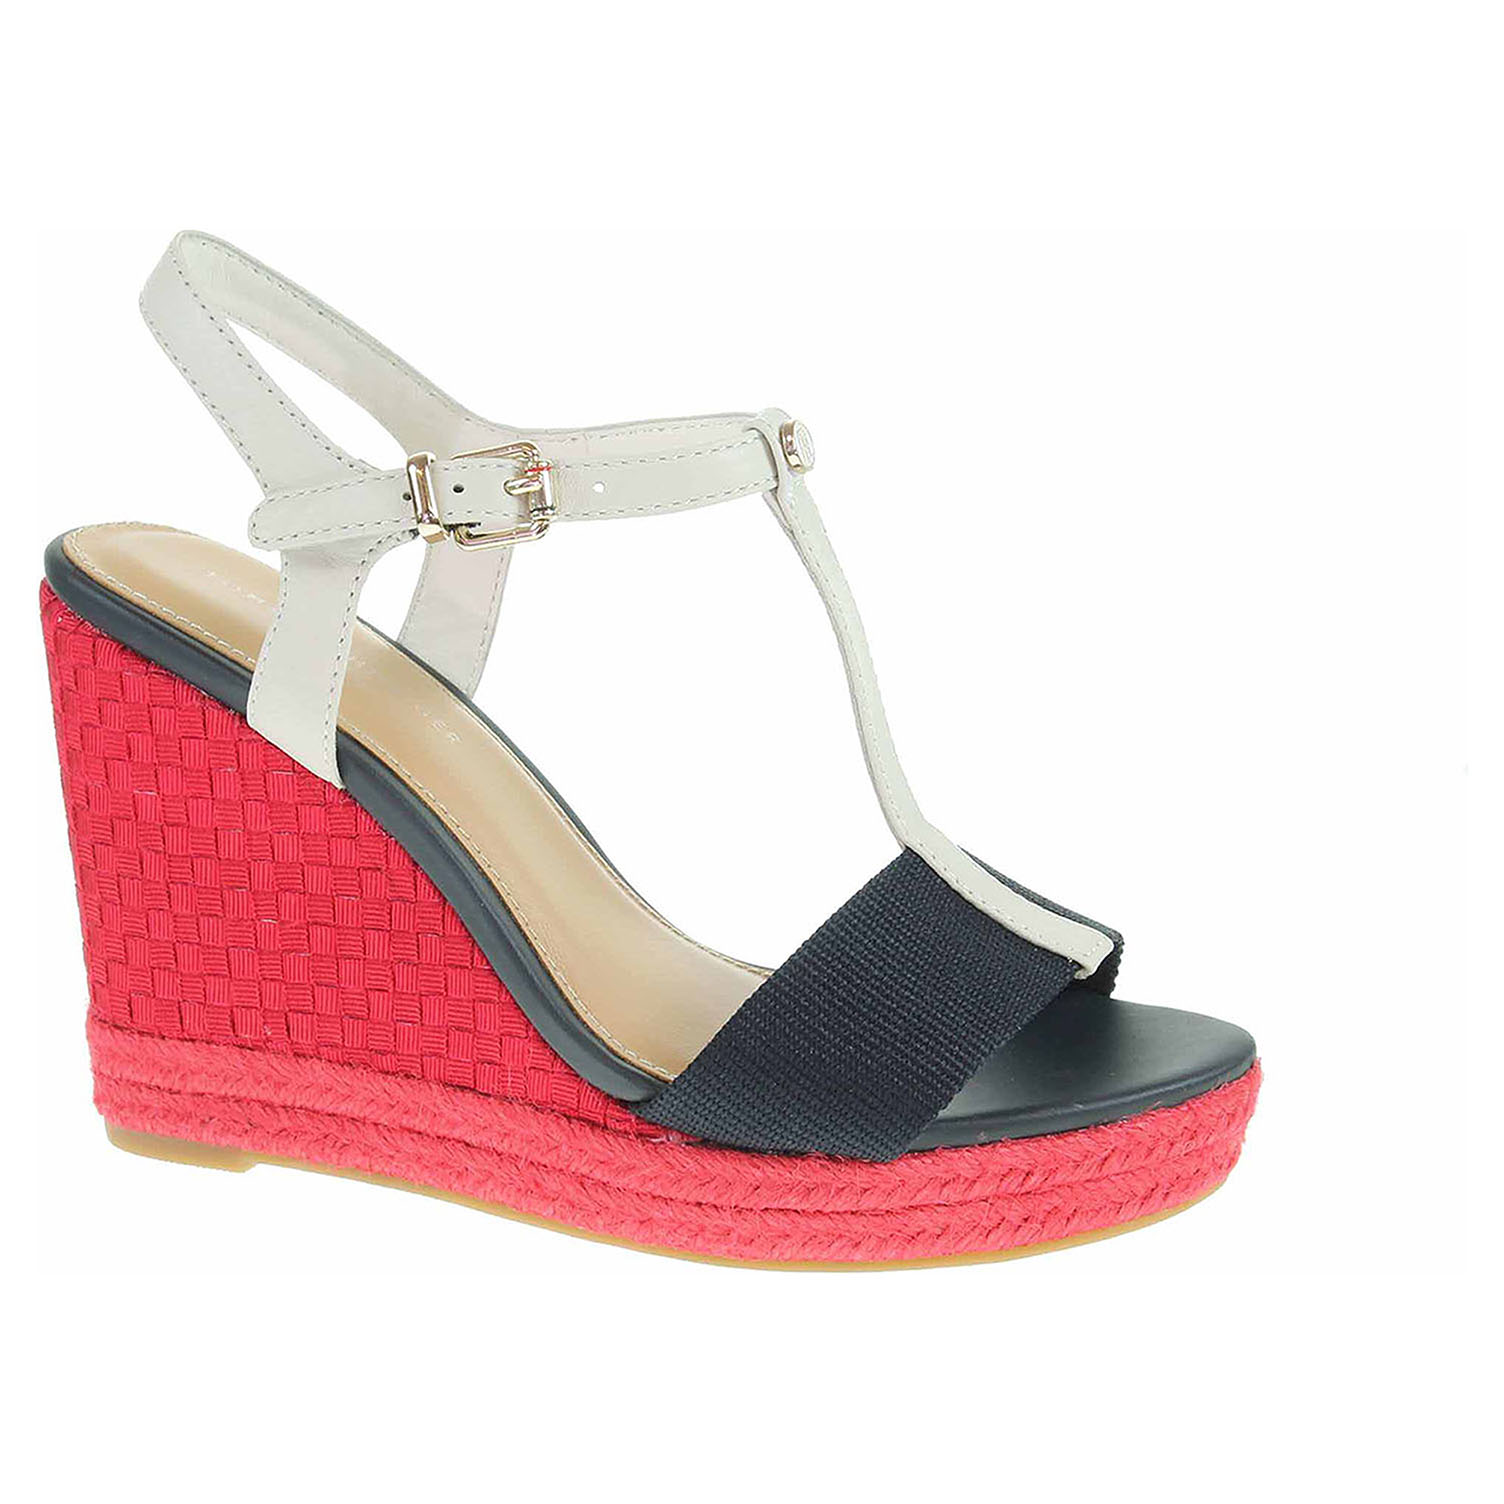 Dámské sandály Tommy Hilfiger FW0FW02249 020 rwb FW0FW02249 020 41